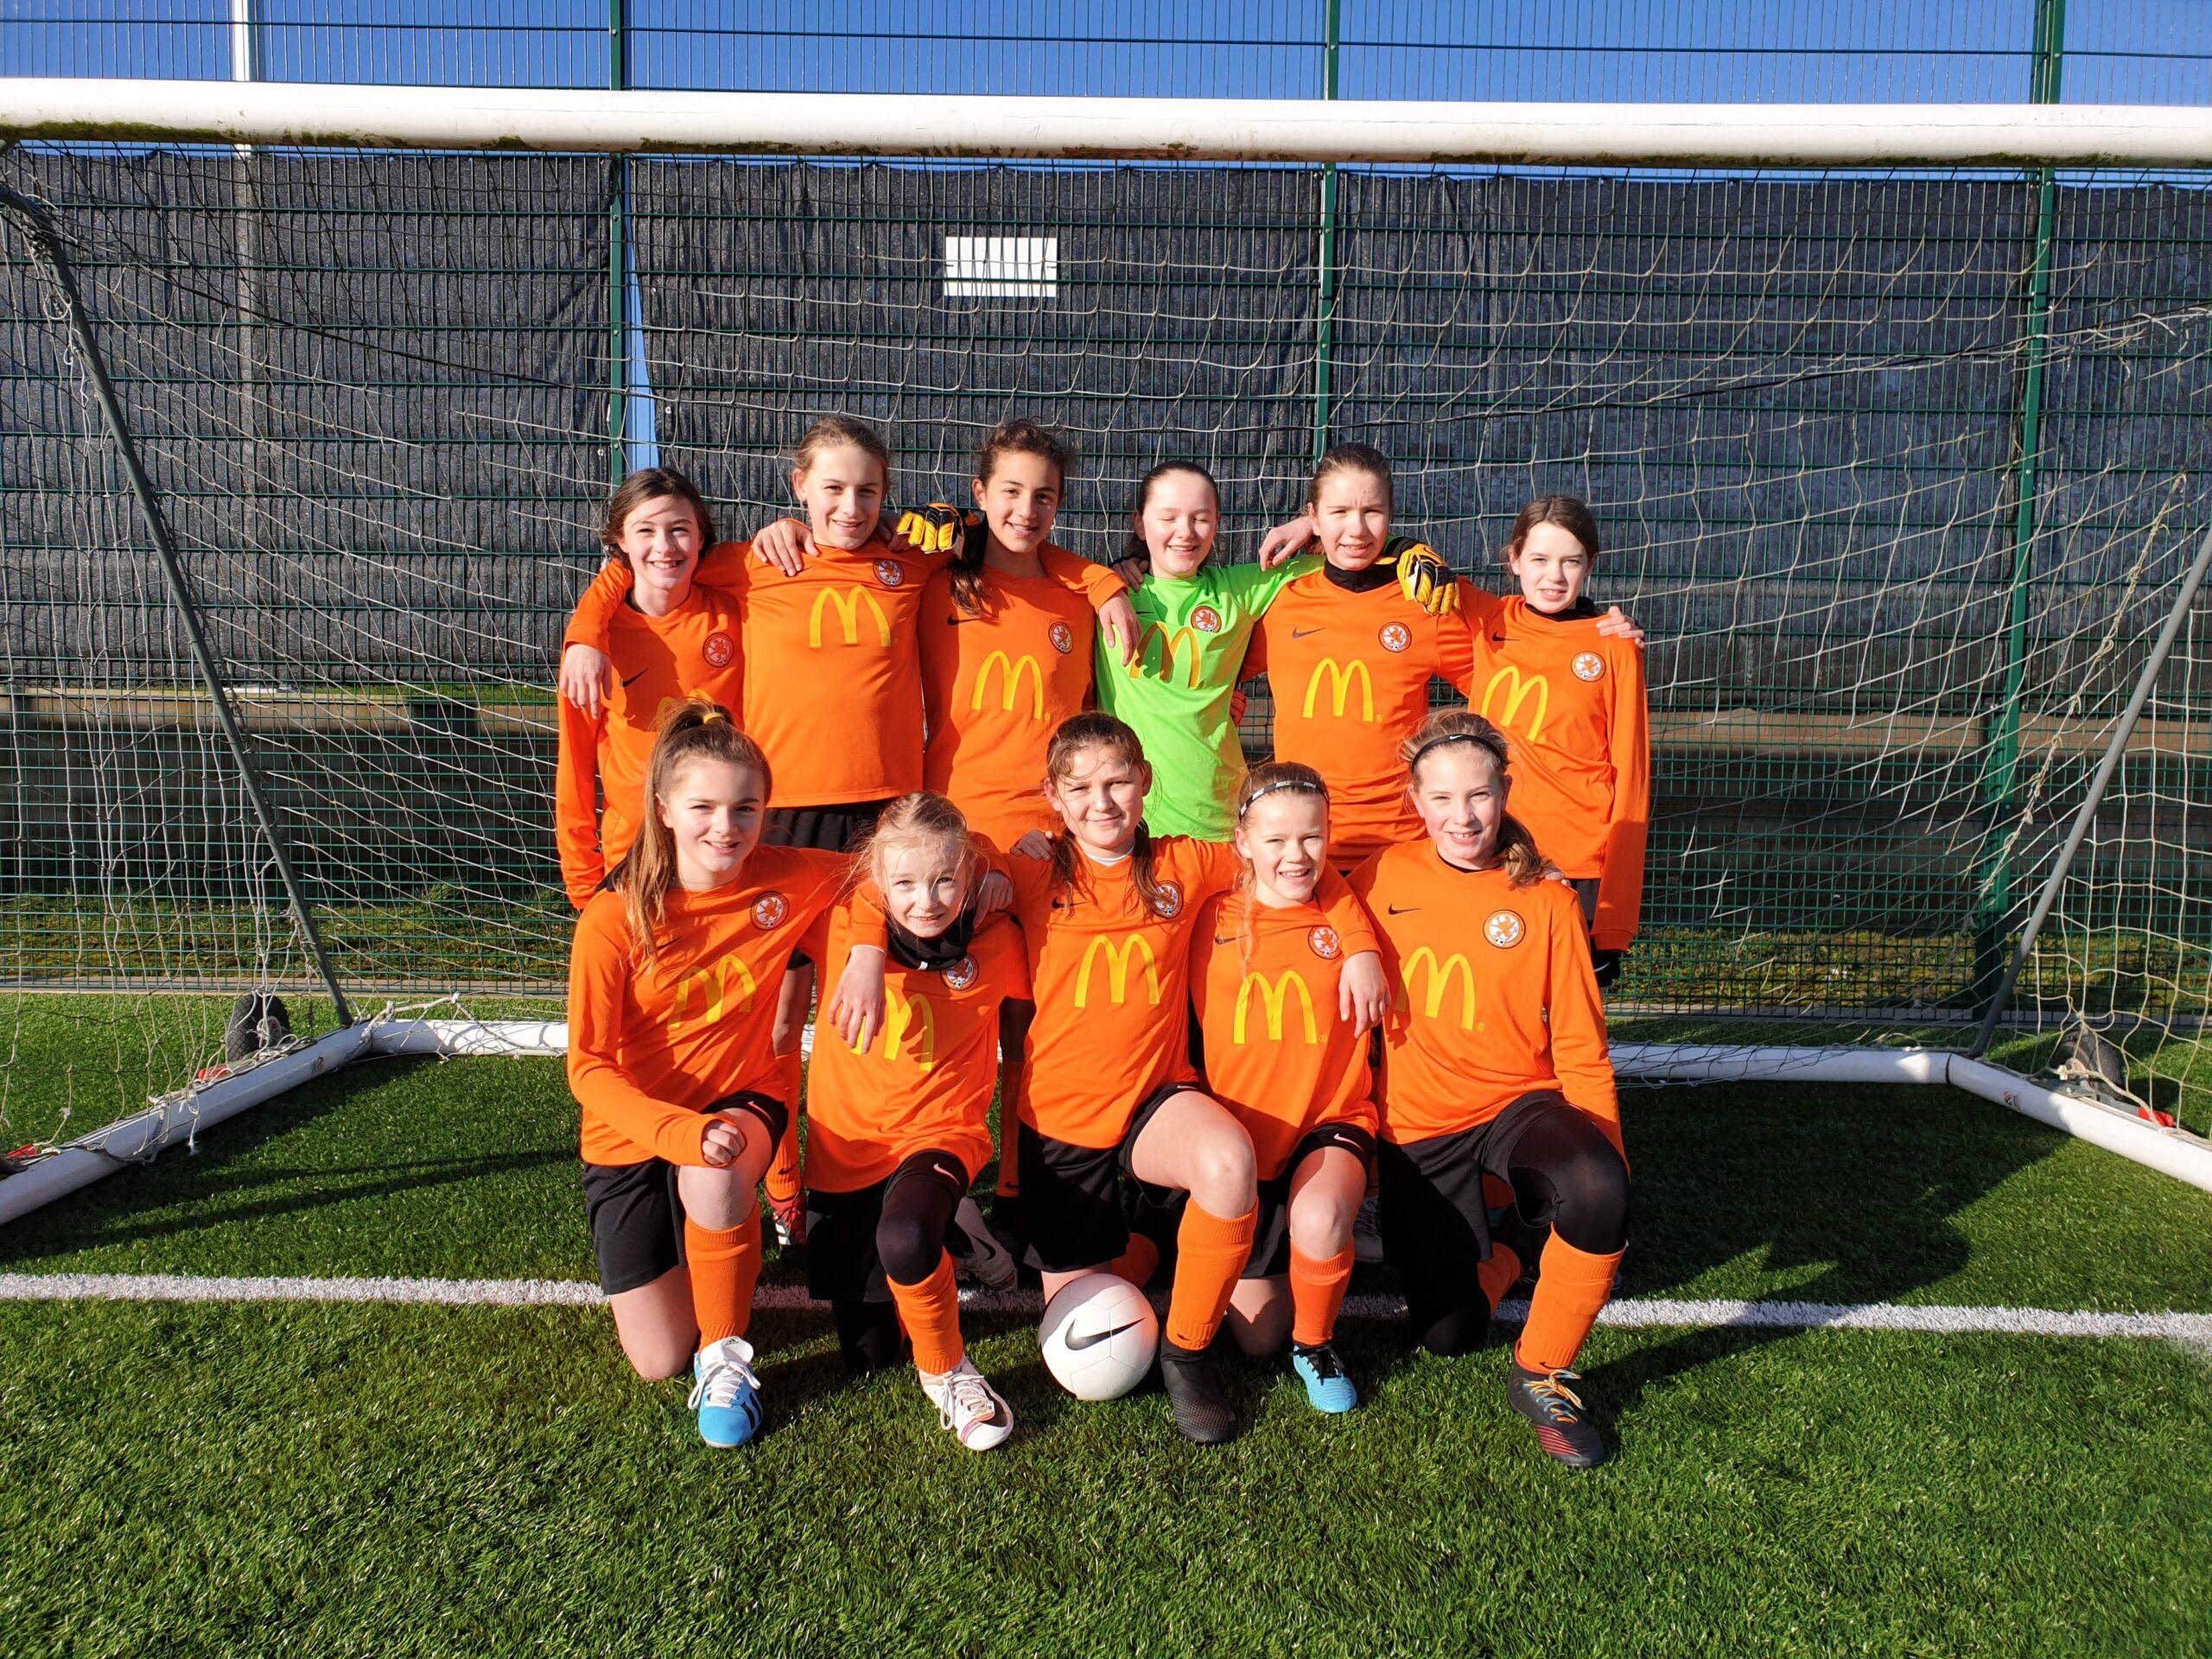 Rugby Borough Girls U12s v Oadby & Wigston Girls - Match photo